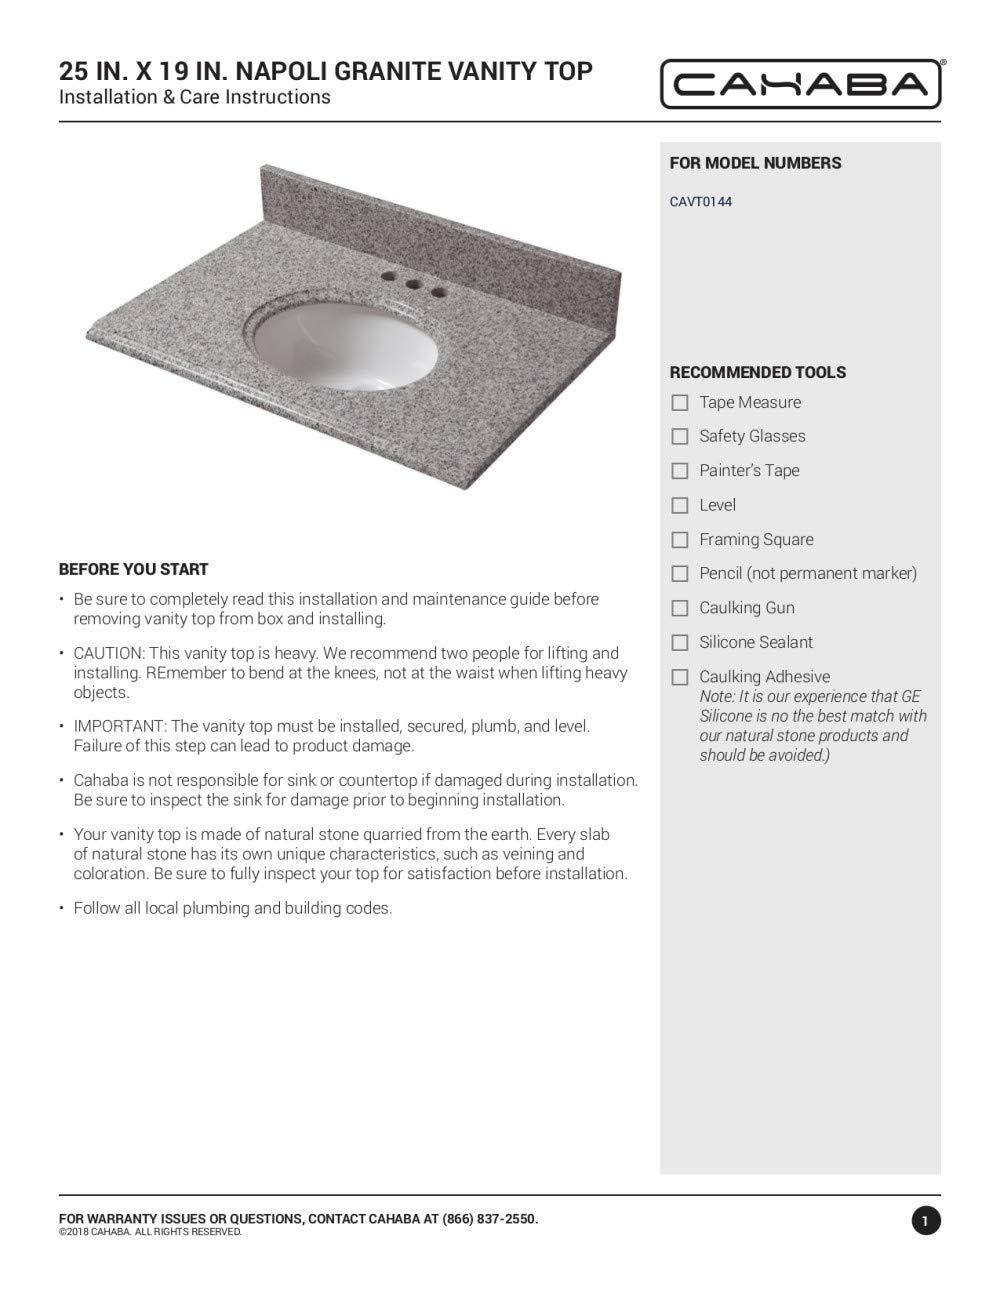 Kitchen & Bath Fixtures CAHABA CAVT0144 25 x 19 Napoli Granite ...